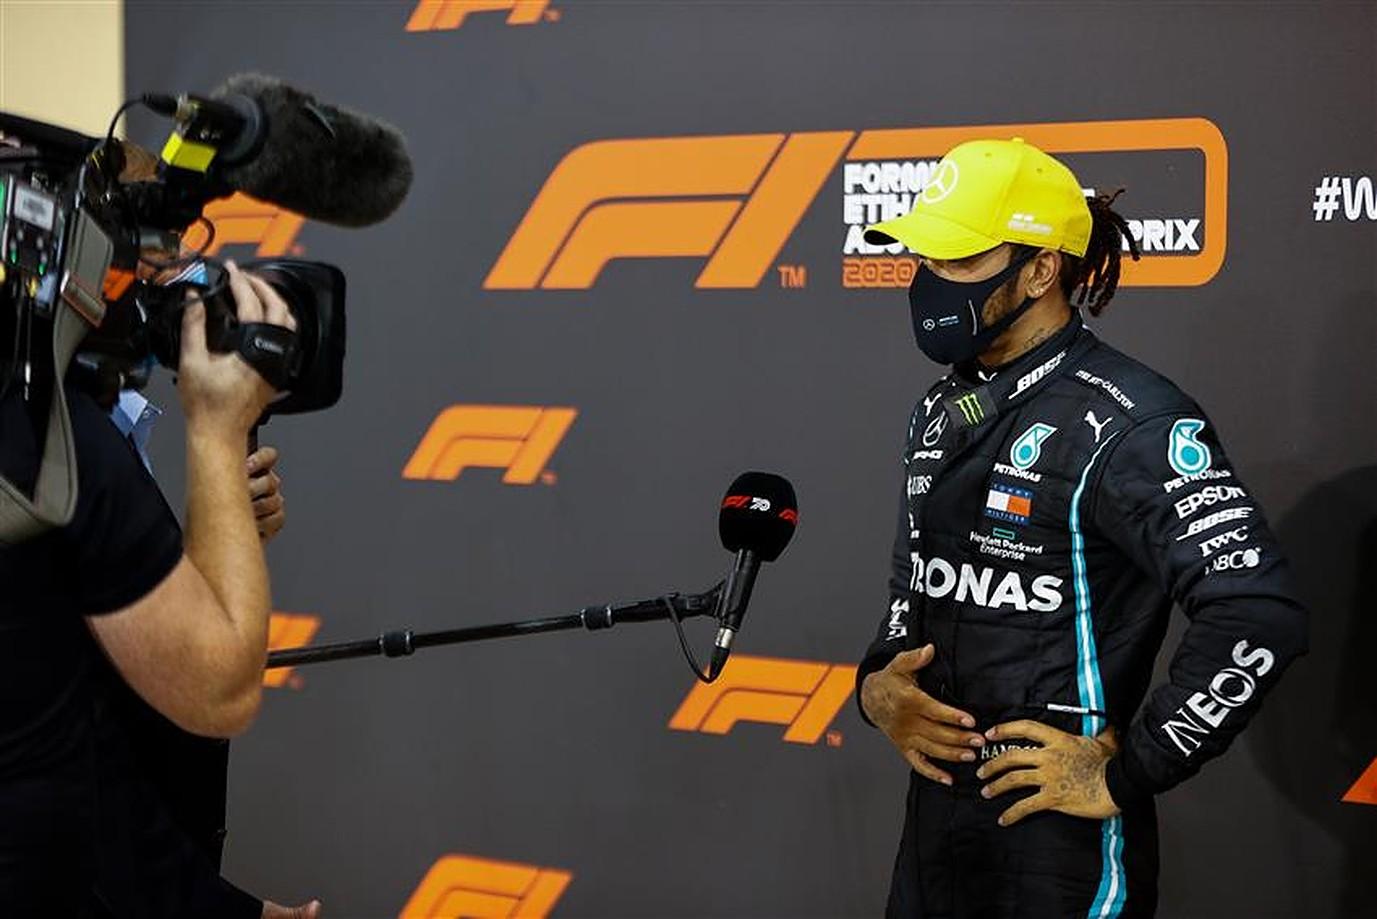 Lewis Hamilton COVID-19 2020 - Formula1News.co.uk